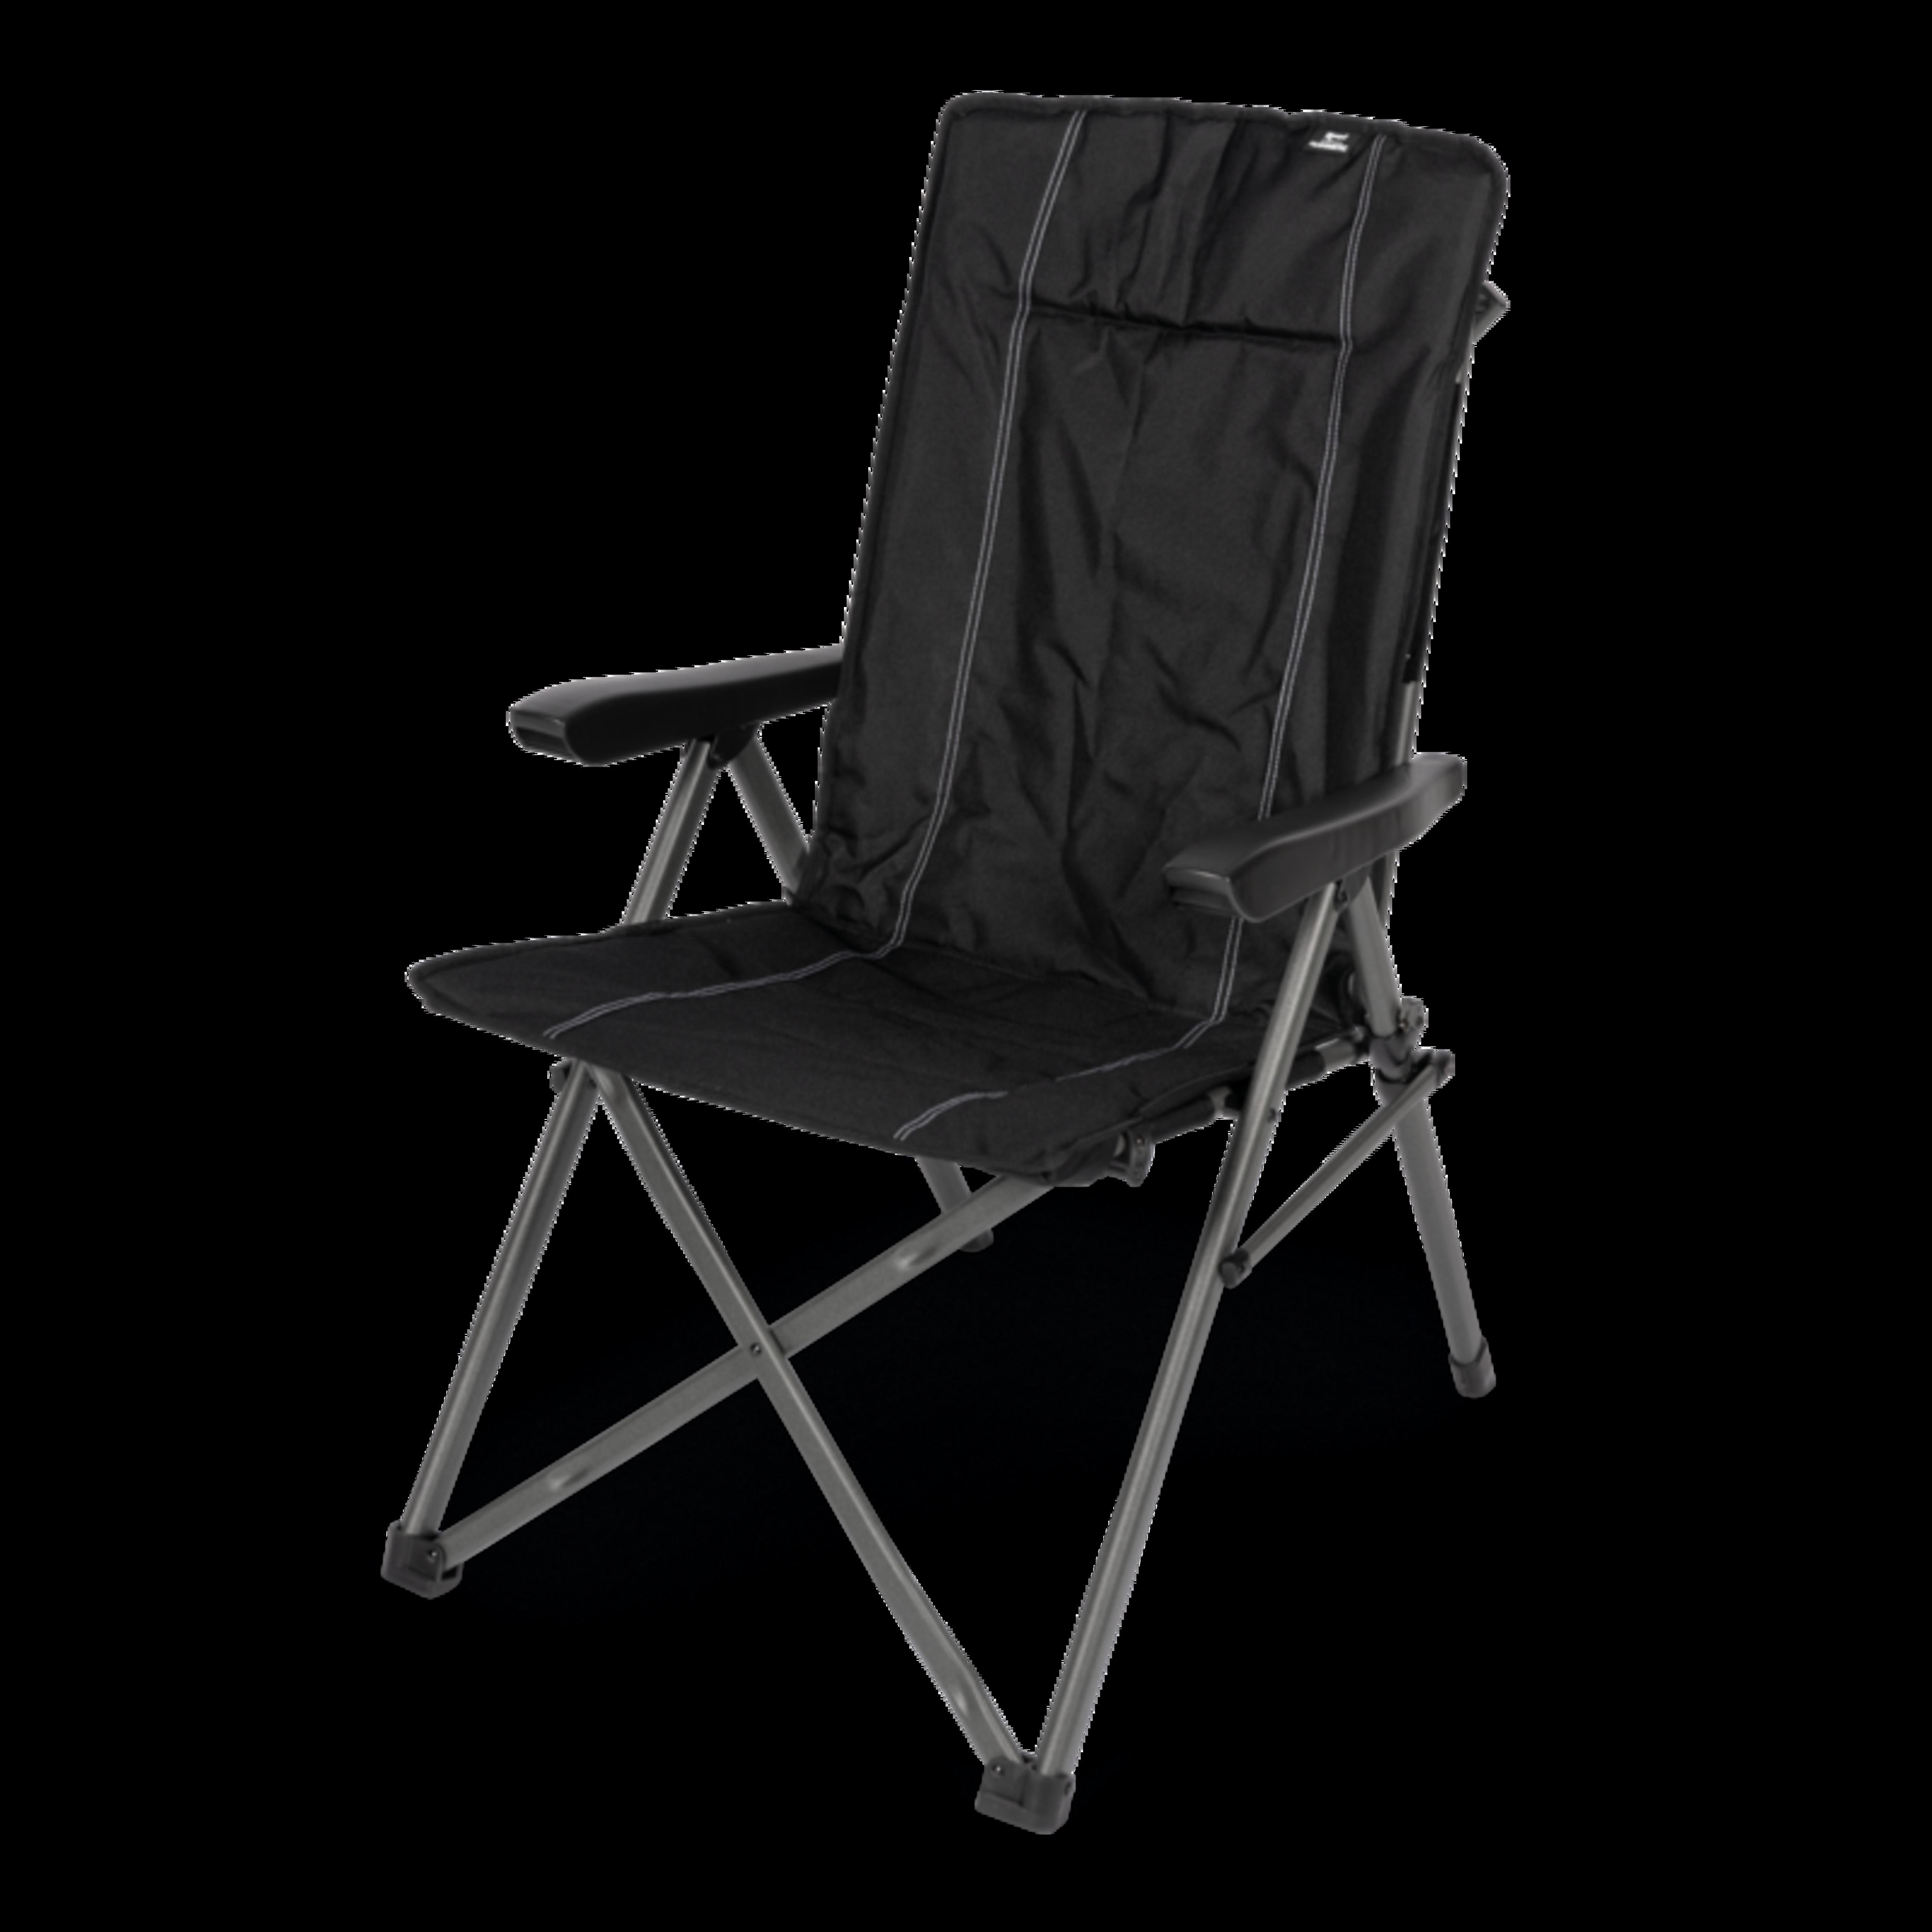 Blue Kampa Consul Compact Folding Reclining Portable Camping Chair